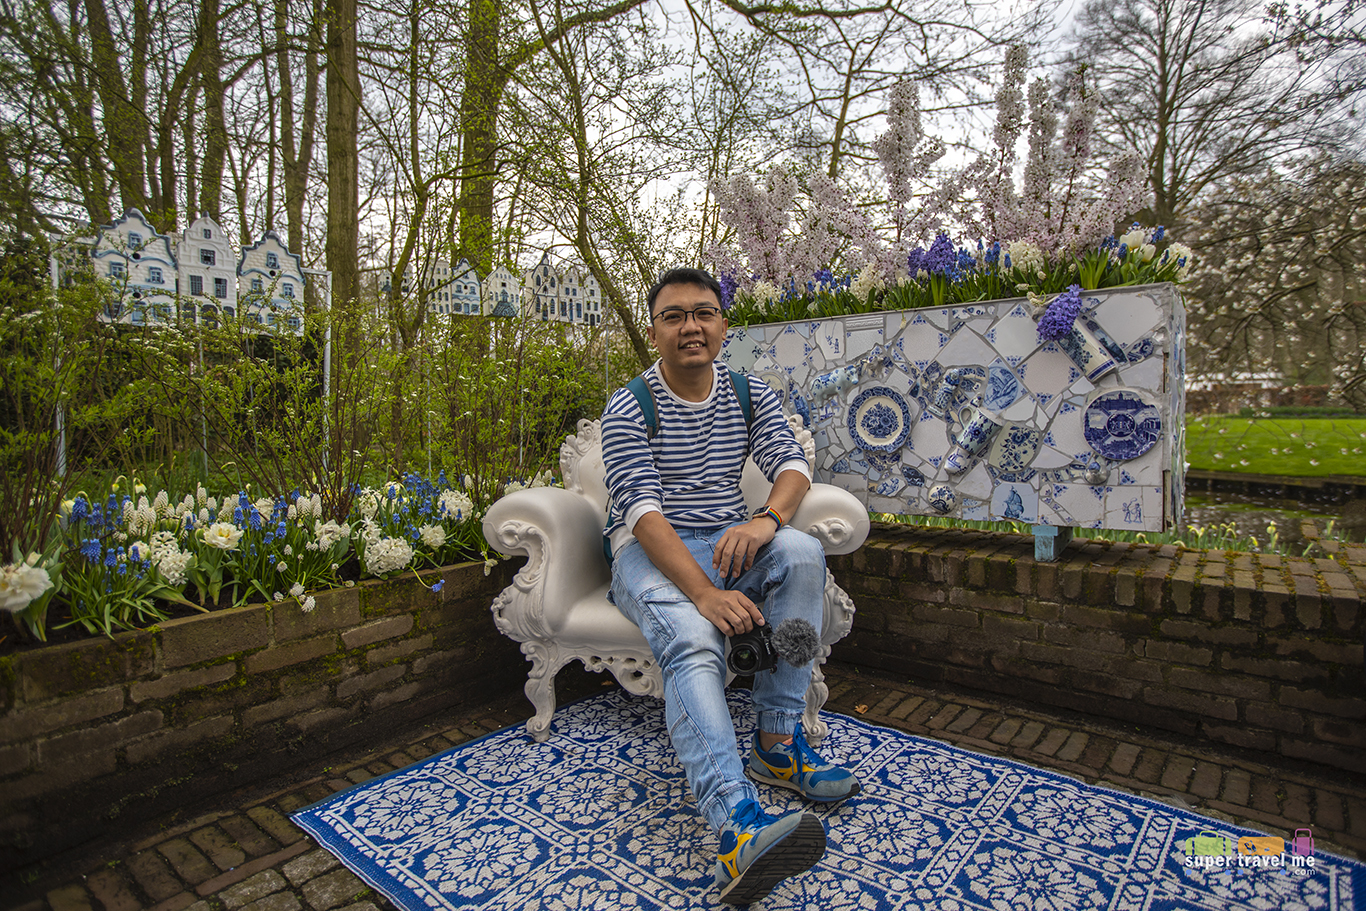 Delft Blue Garden at Keukenhof 2018 Season